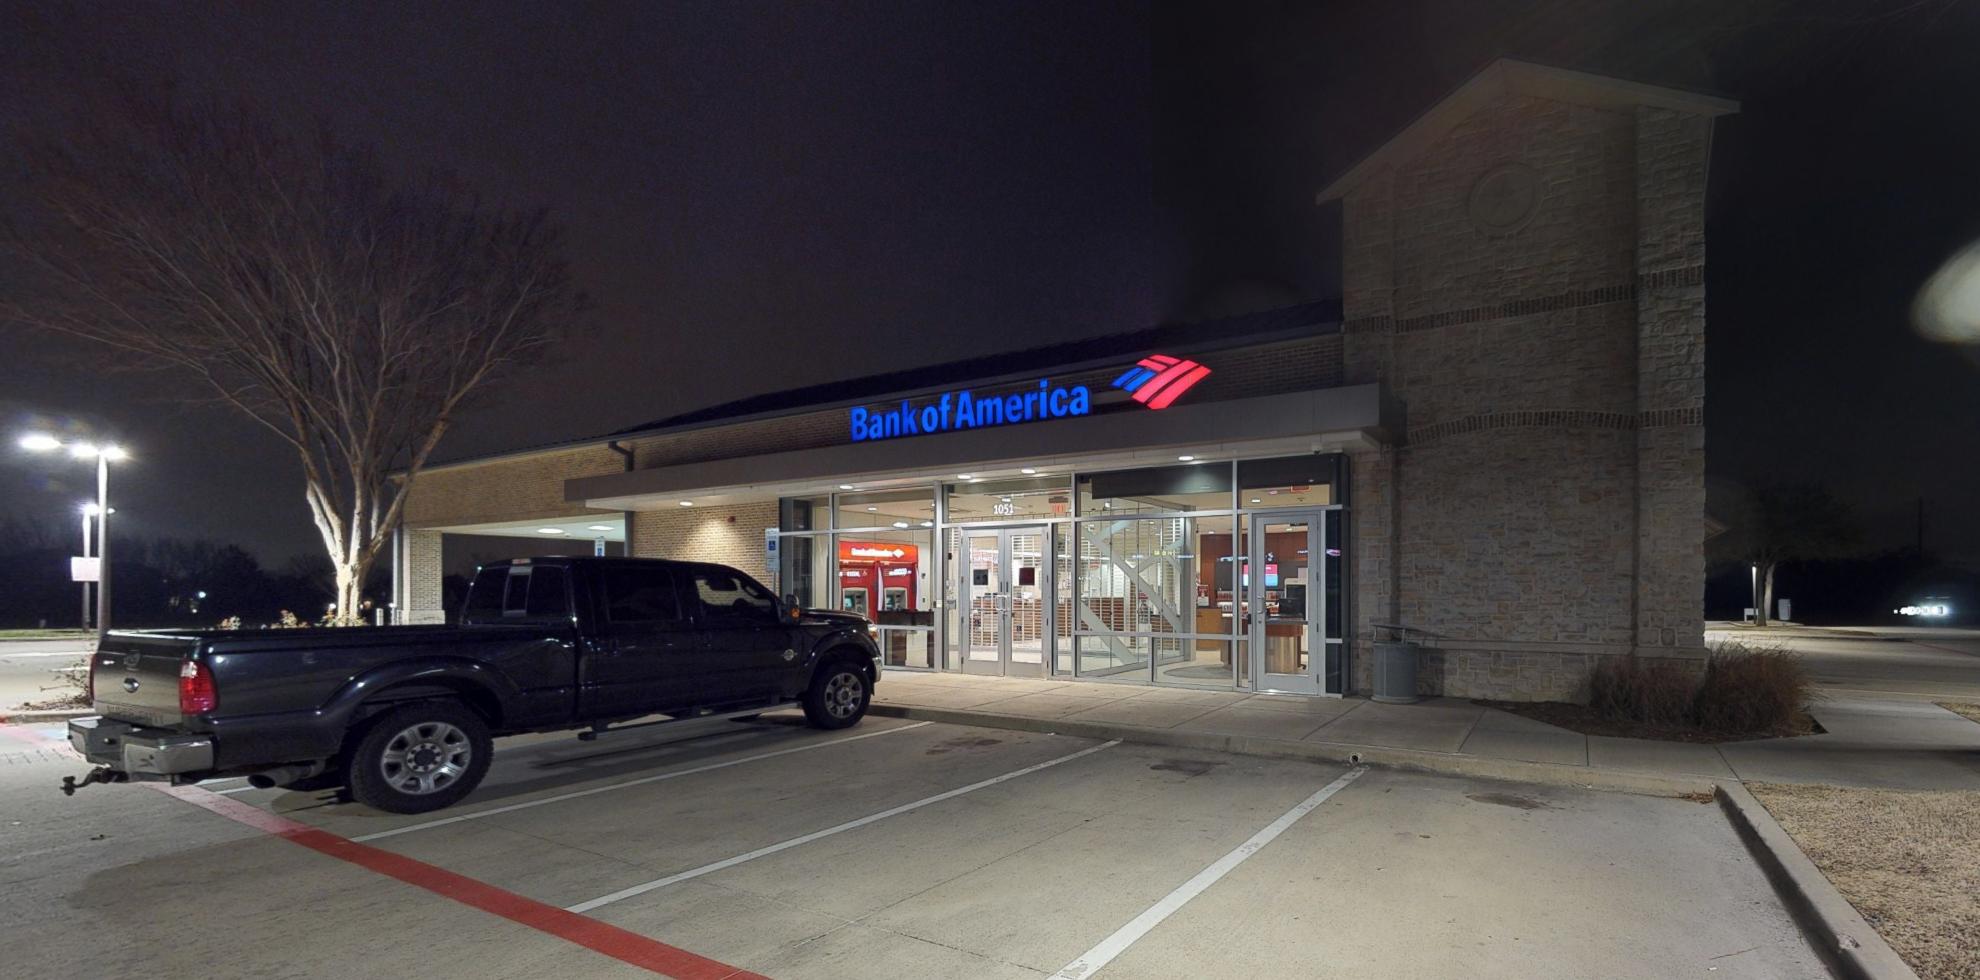 Bank of America financial center with drive-thru ATM   1051 Flower Mound Rd, Flower Mound, TX 75028